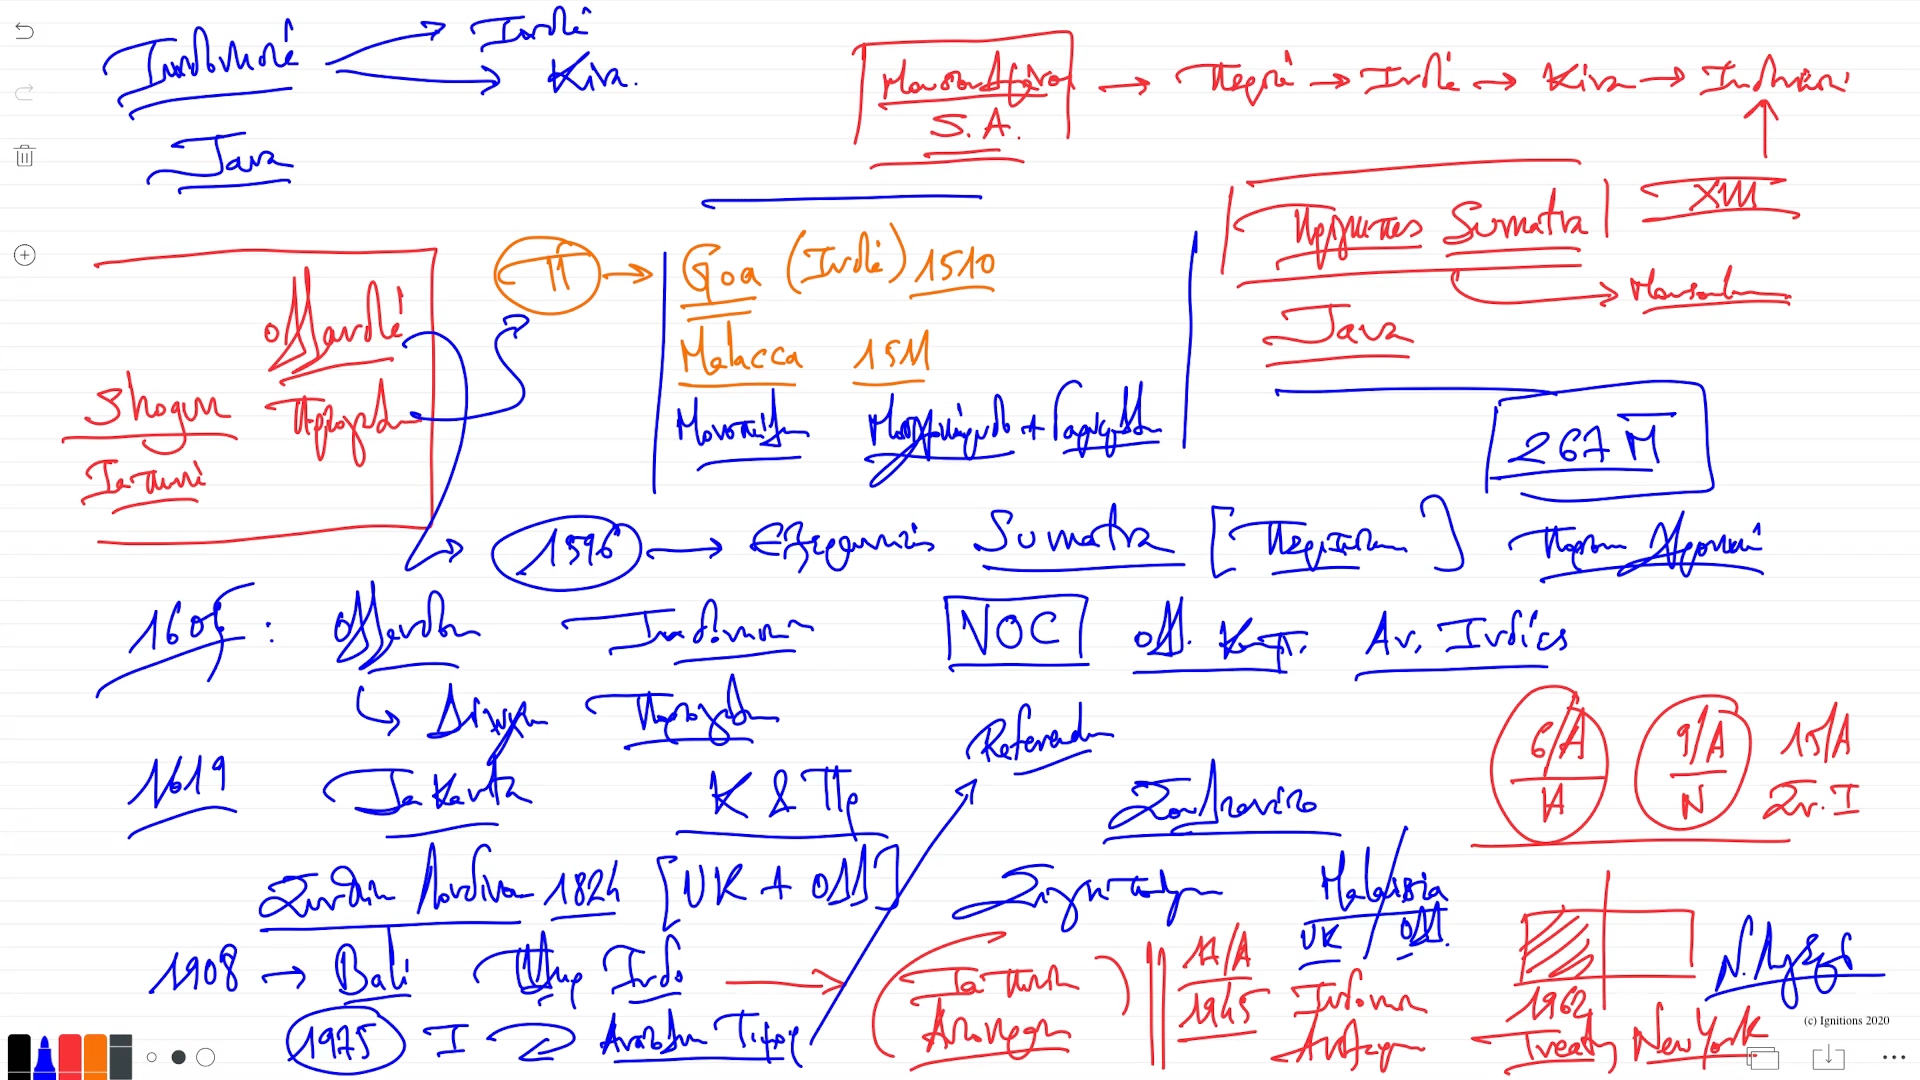 56543 - III - e-Μάθημα: Χρονοστρατηγική ανάλυση Ινδονησίας. (Dessin)